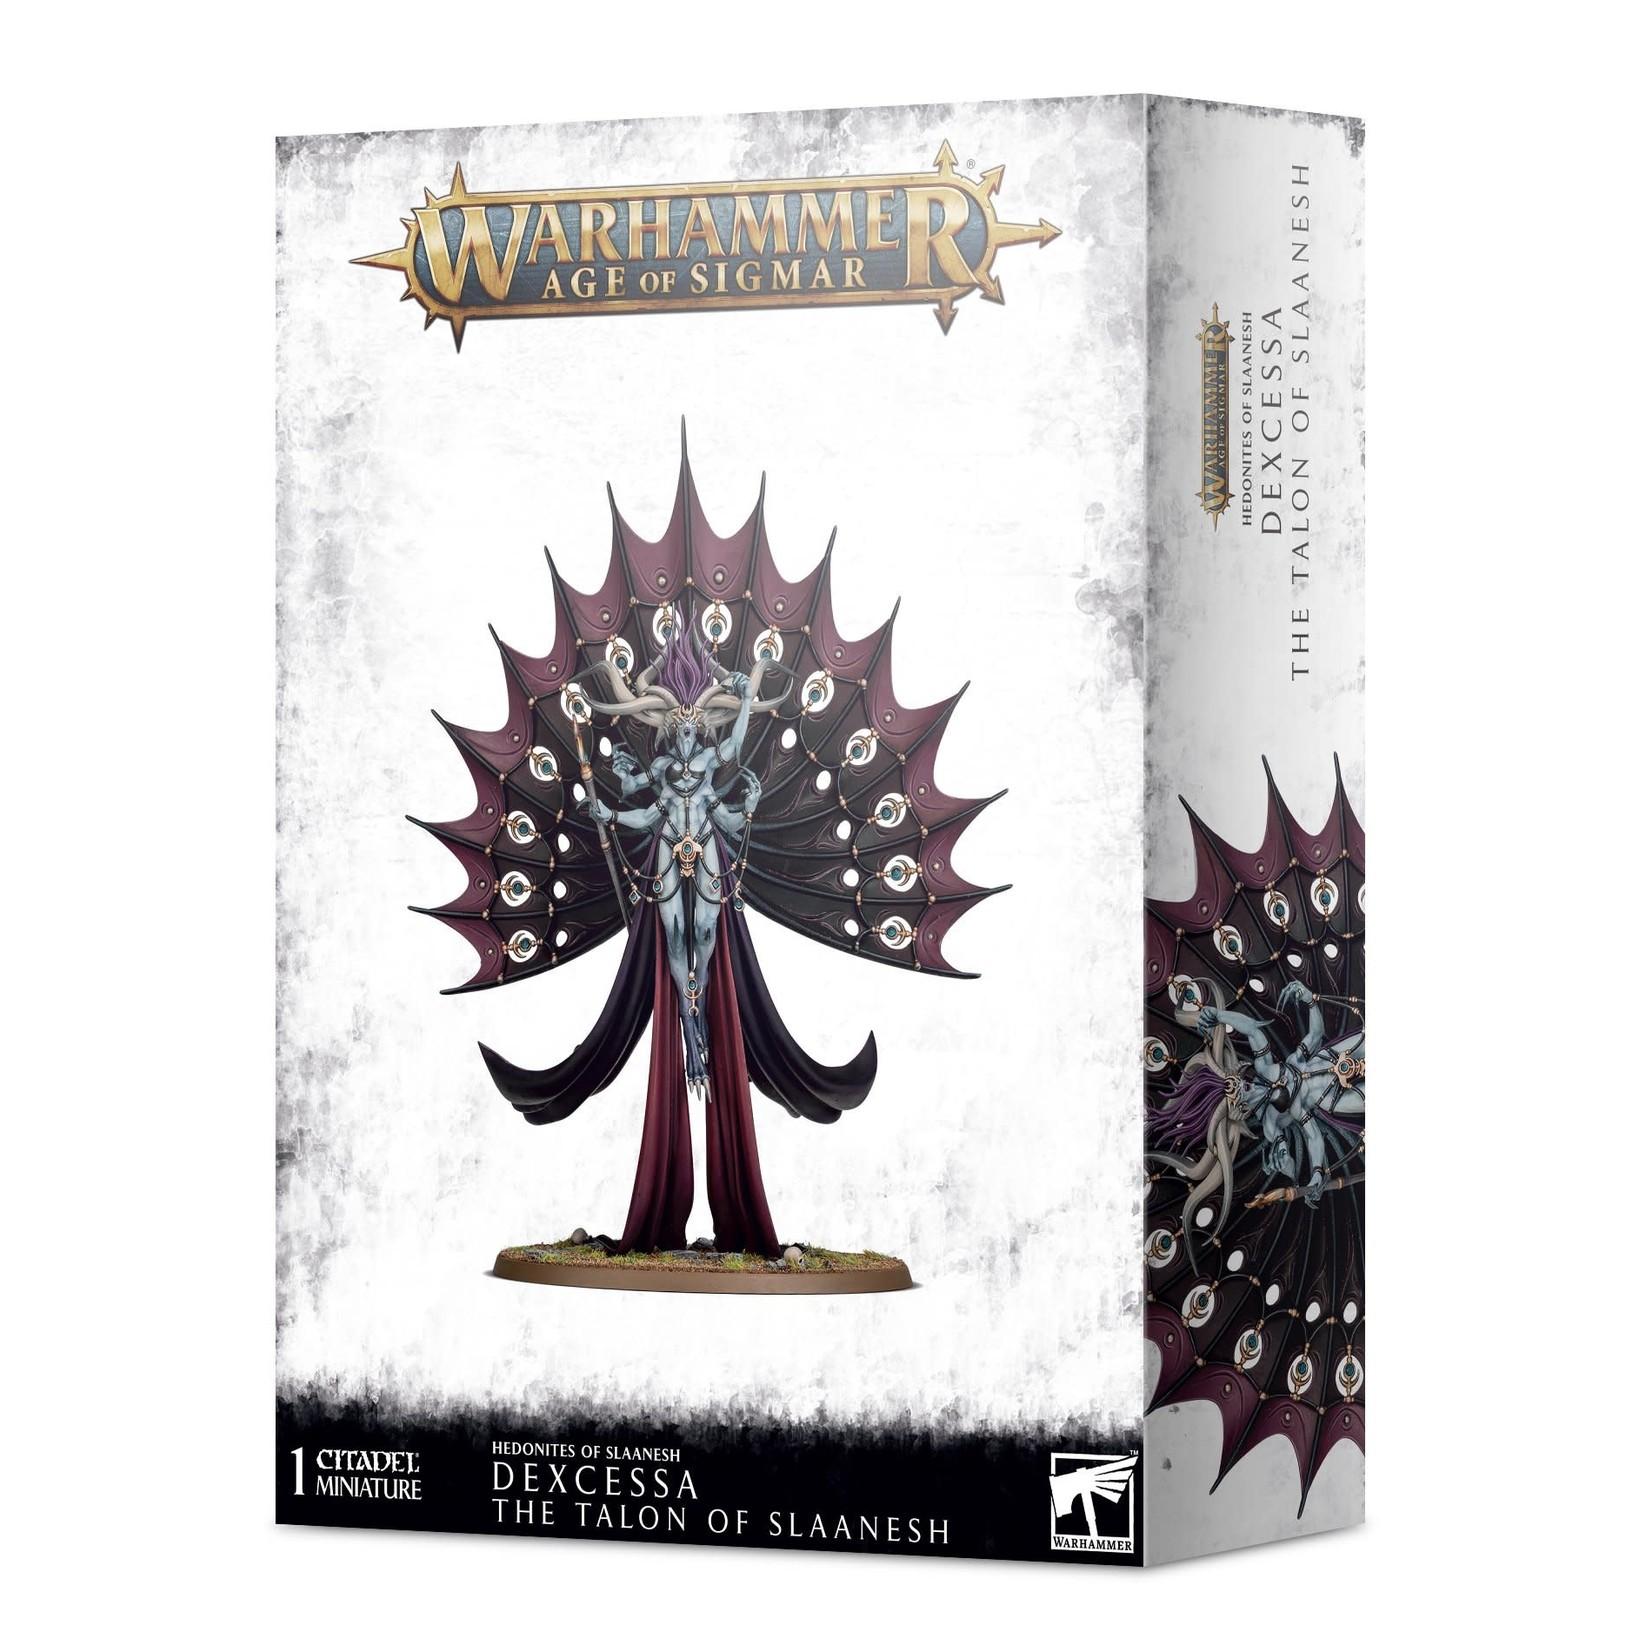 Games Workshop Warhammer Age of Sigmar: Hedonites of Slaanesh - Dexcessa the Talon of Slaanesh